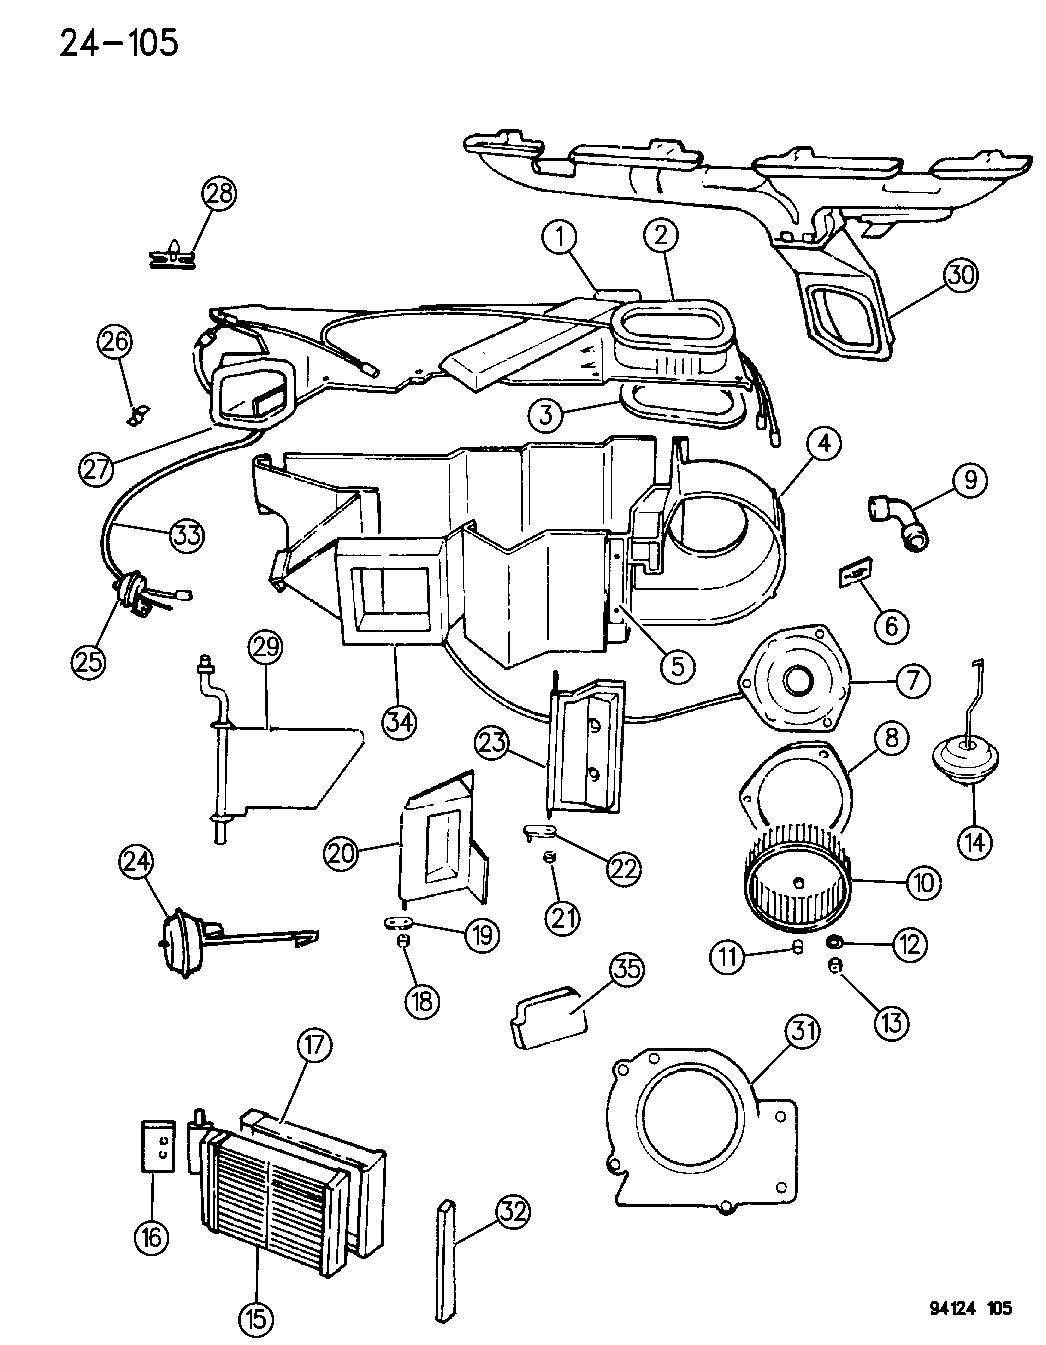 1994 chrysler lebaron gtc heater unit